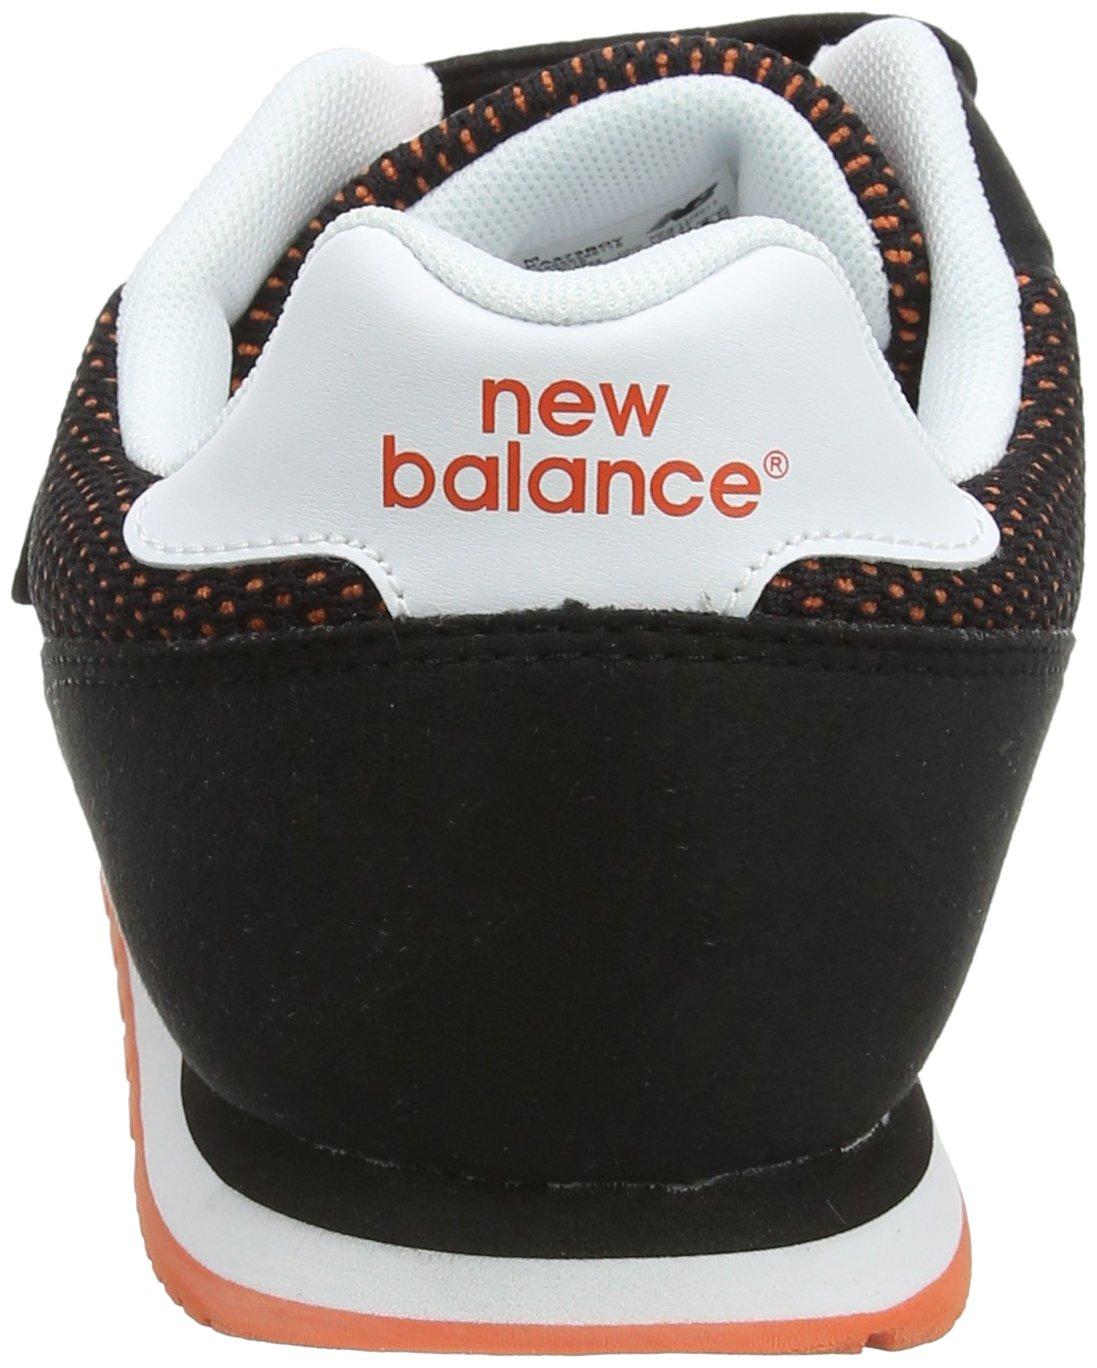 new balance ka373v1y